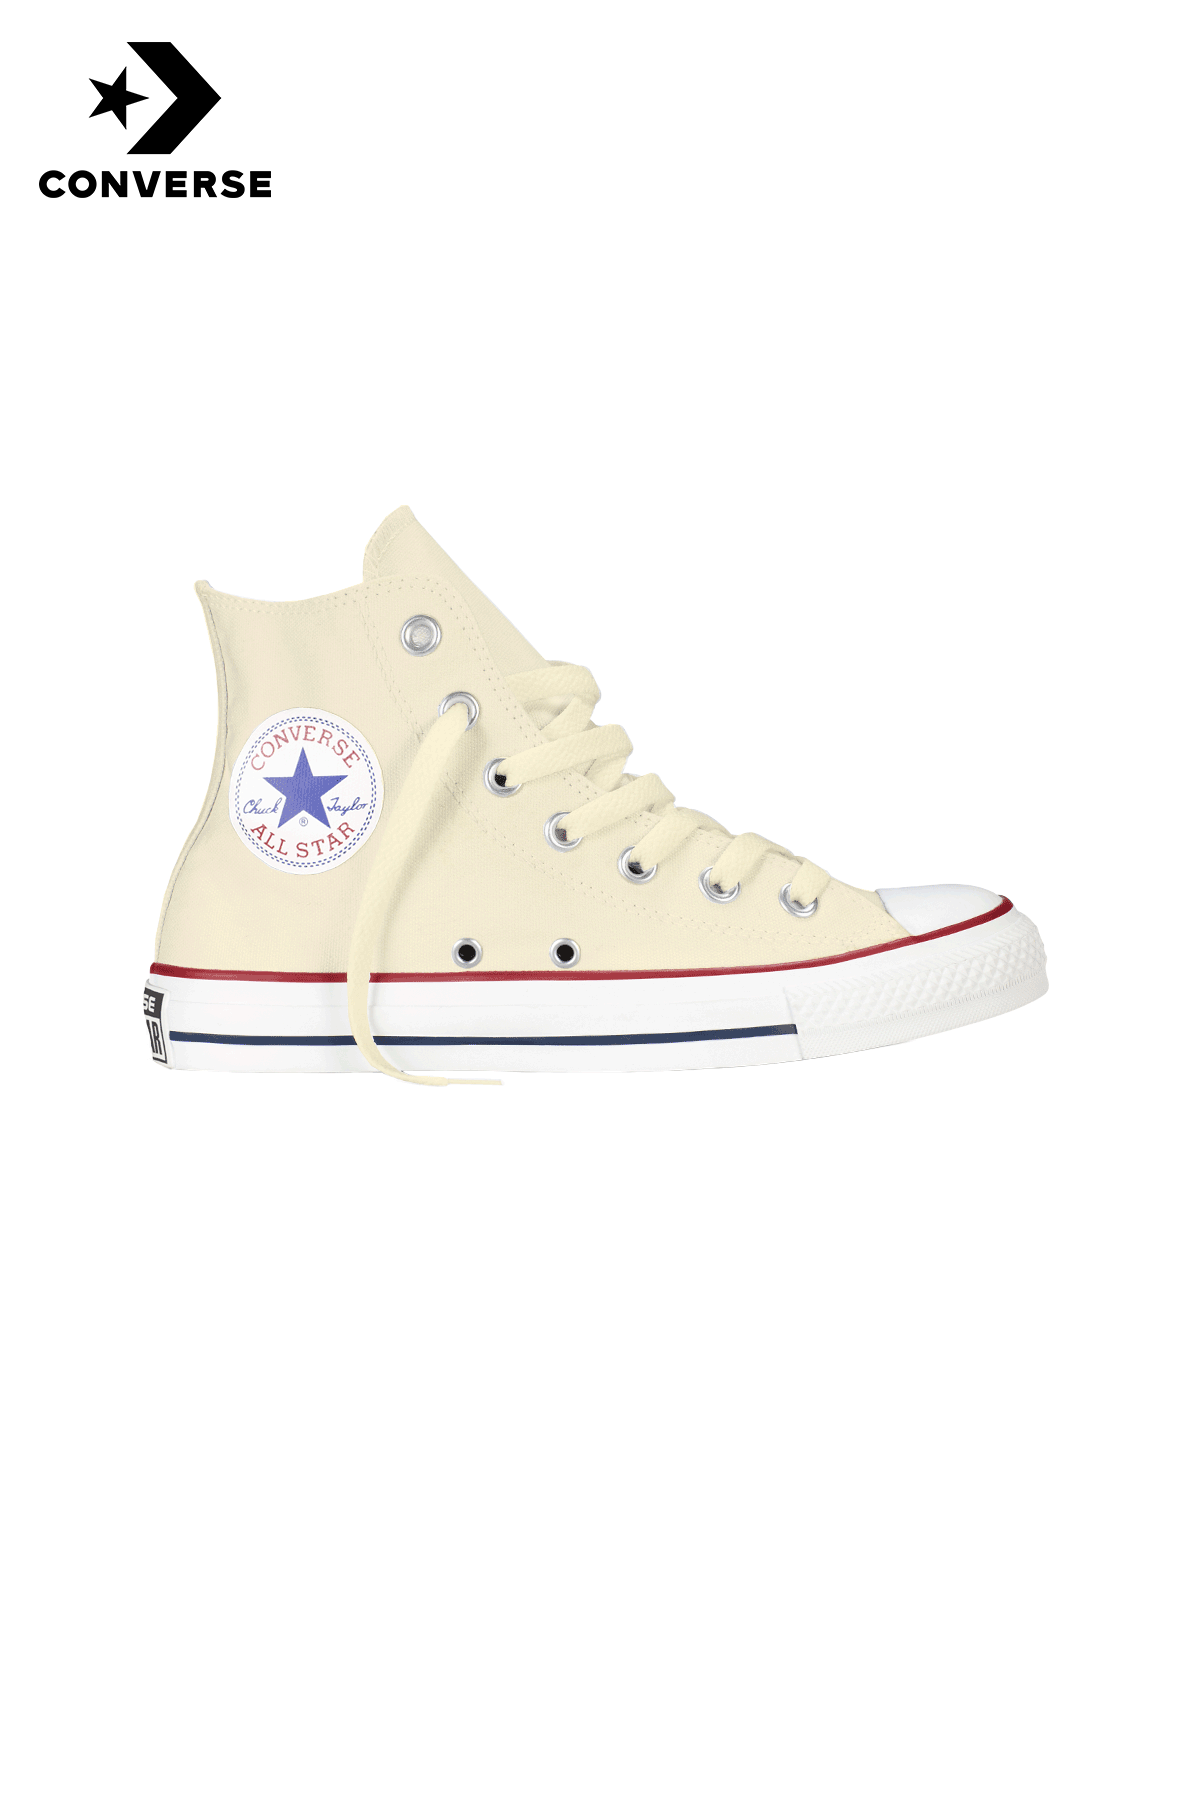 Converse All Stars All Star Hi canvas